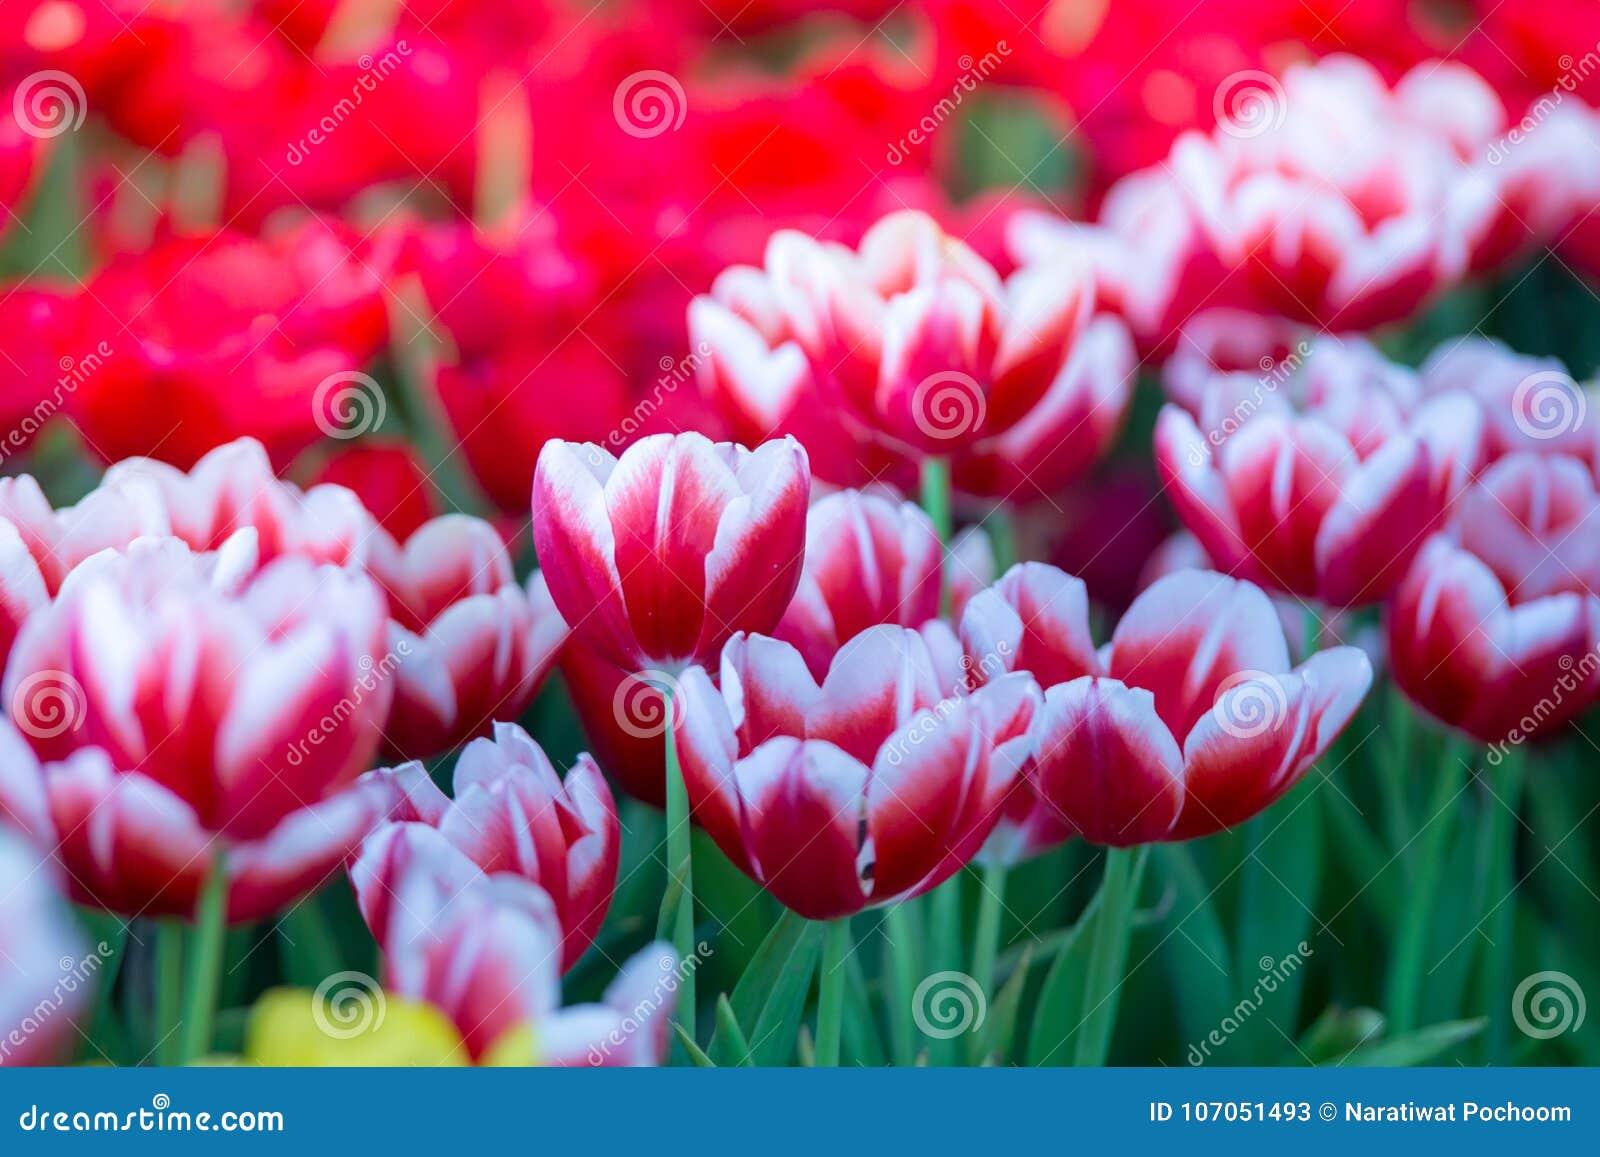 Tulips Flowers Beautiful Bouquet Of Tulips Colorful Flowers Background Wallpaper Stock Image Image Of Flower Keukenhof 107051493